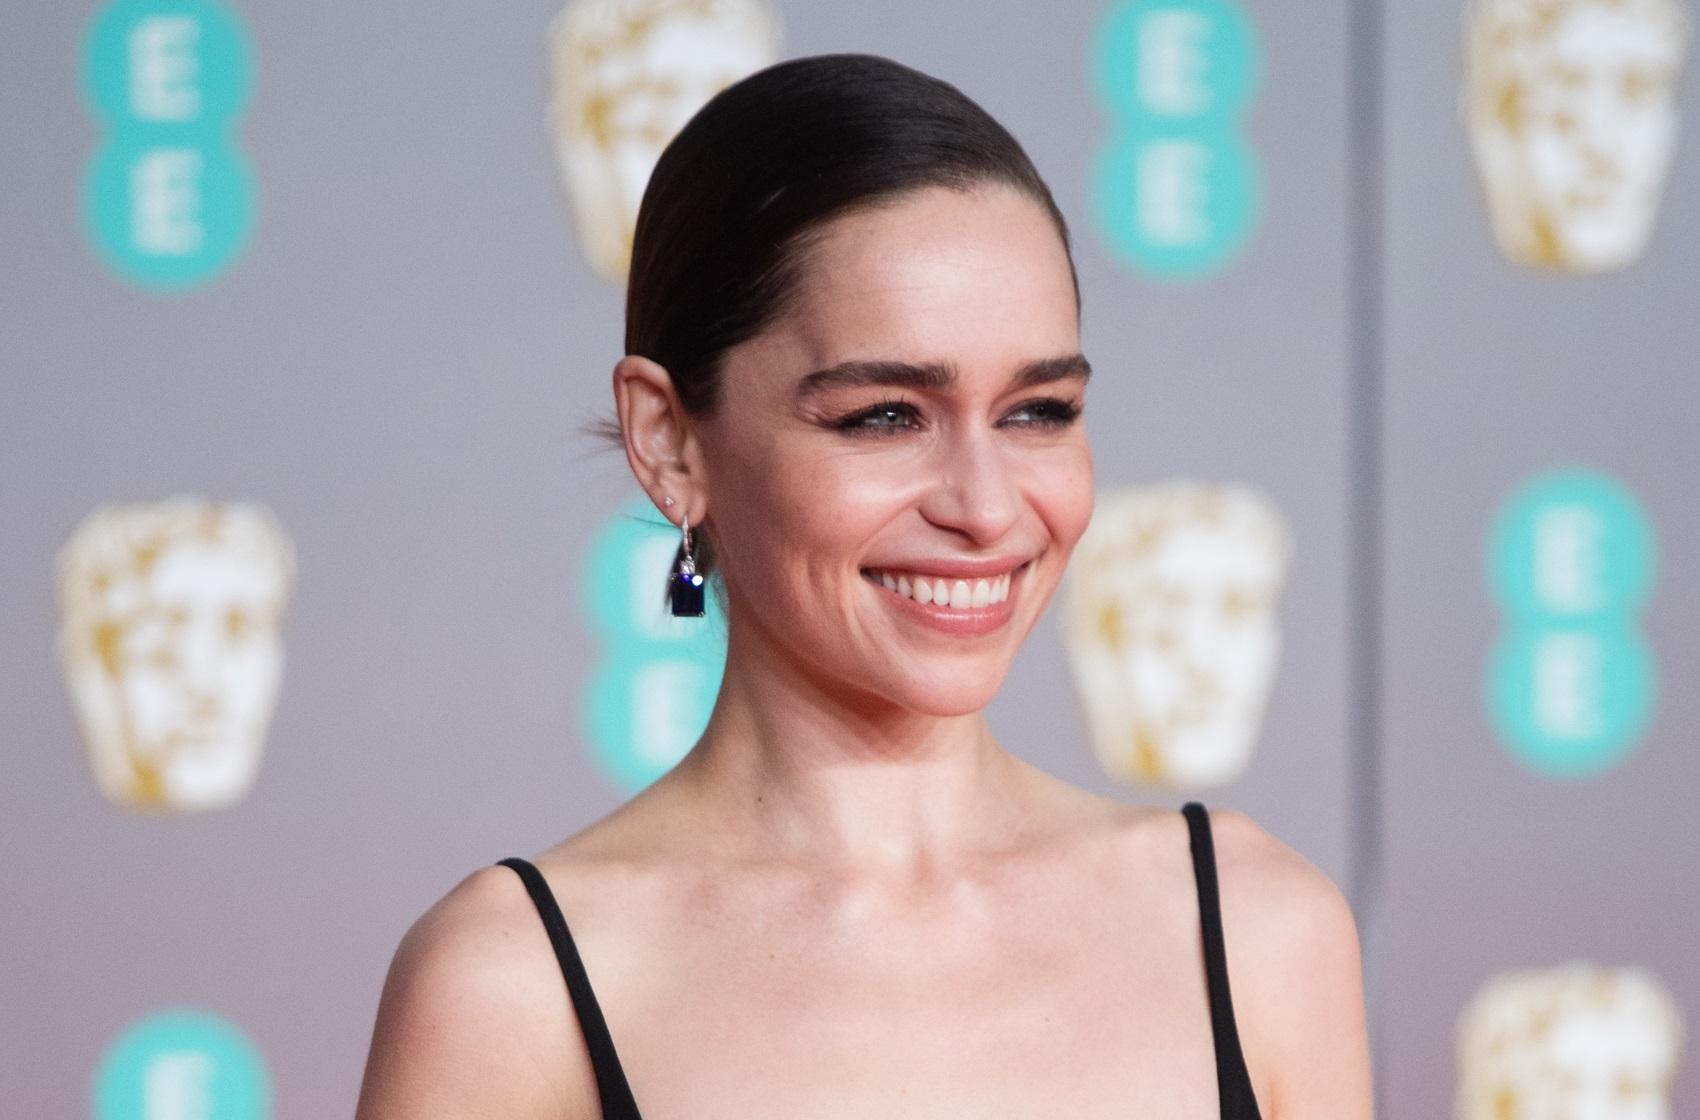 Emilia Clarke played Daenerys Targaryen in Game of Thrones